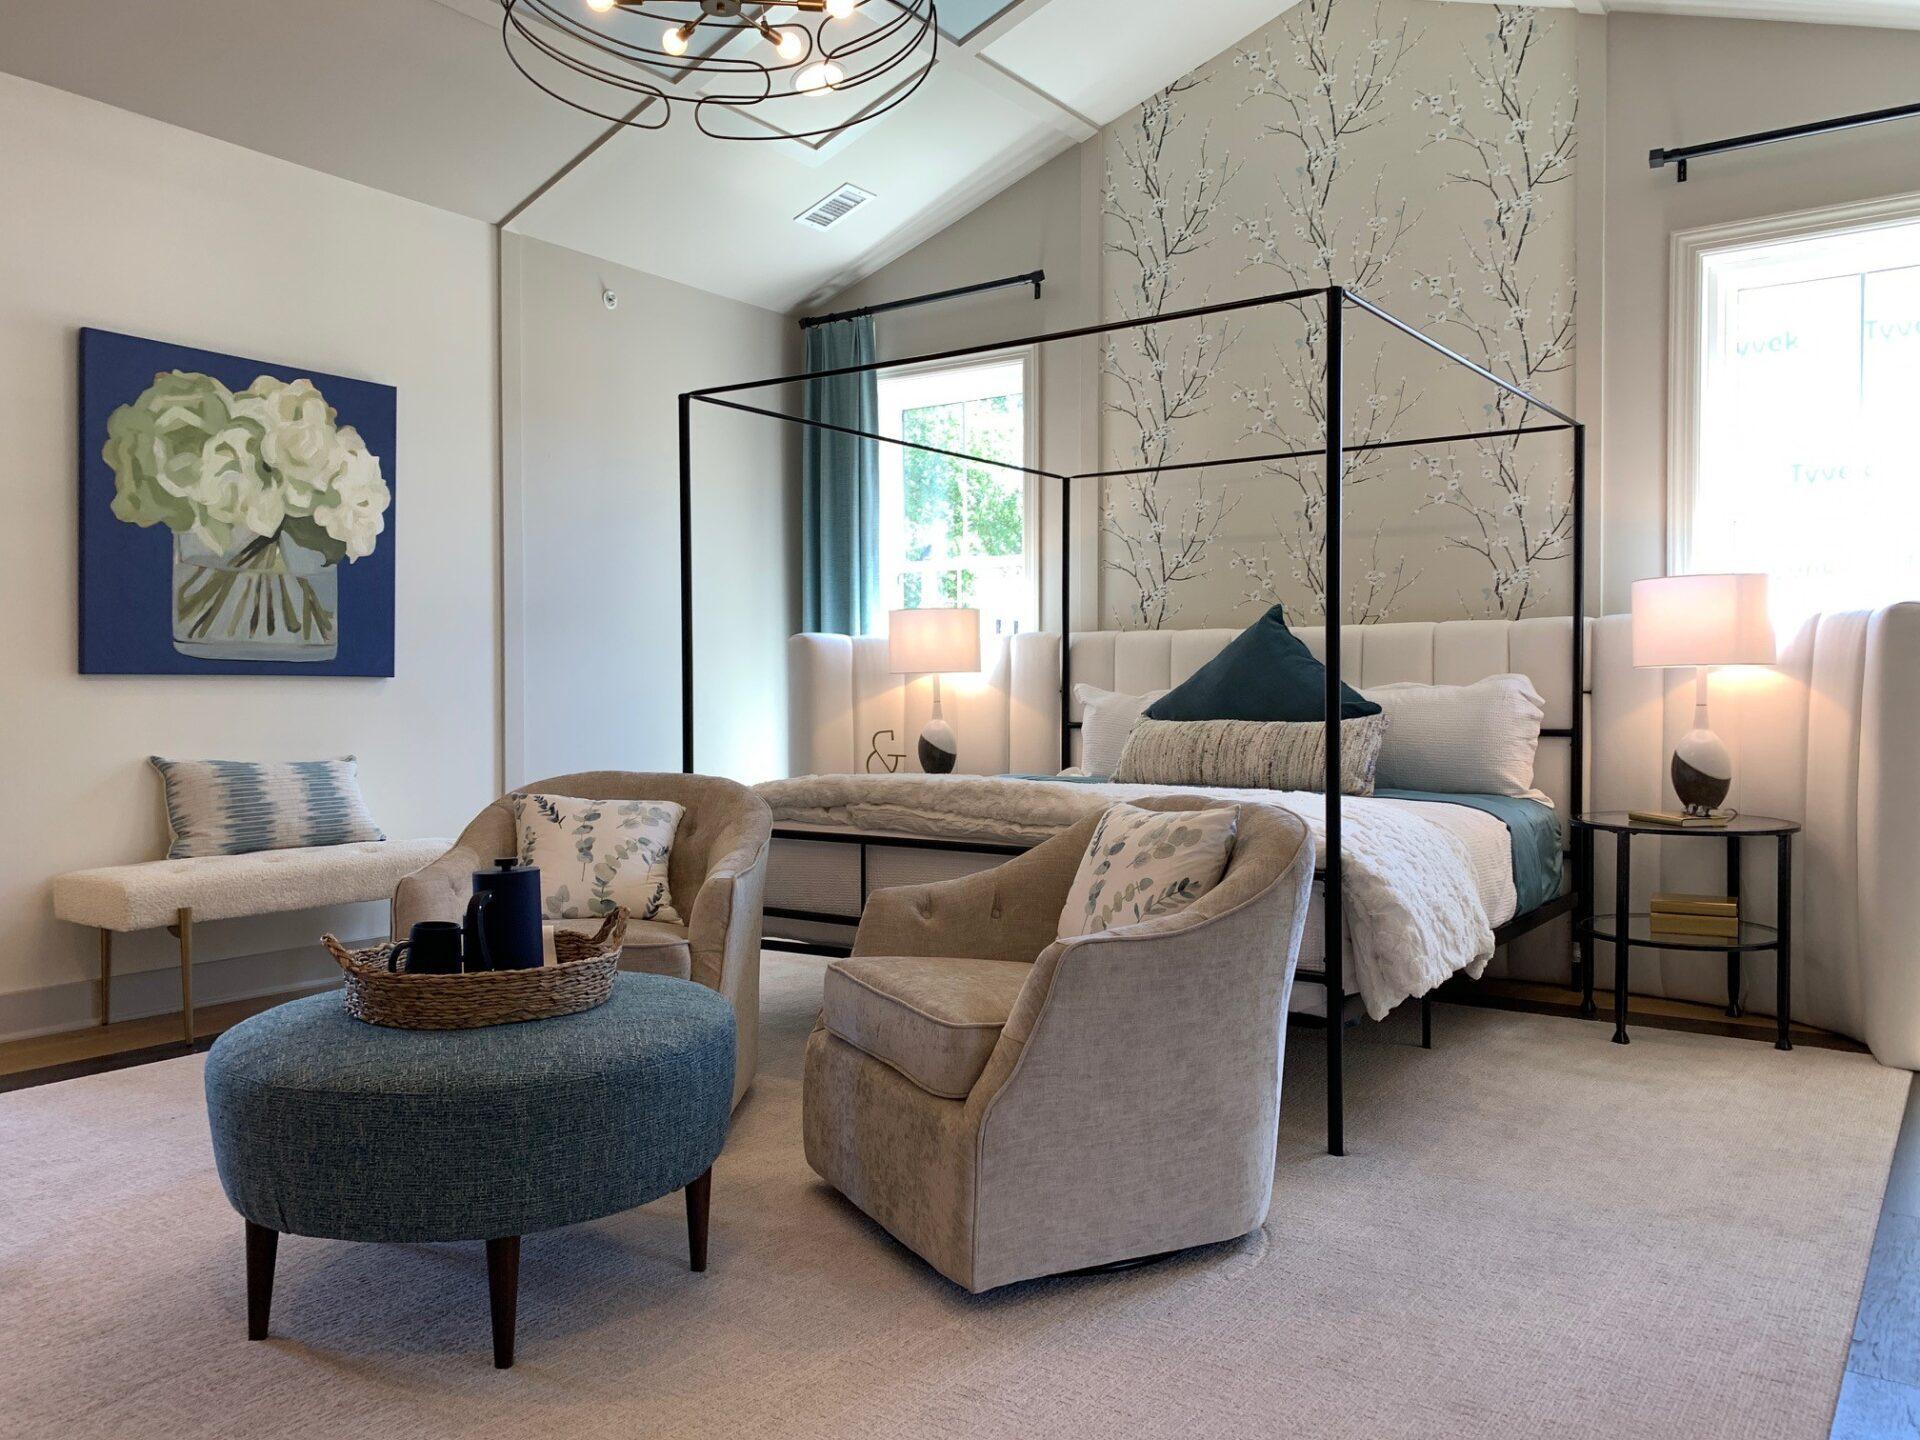 Custom_Built_Furniture-The-Big-Difference_Blend-Home-Furnishings-Nashville-TN